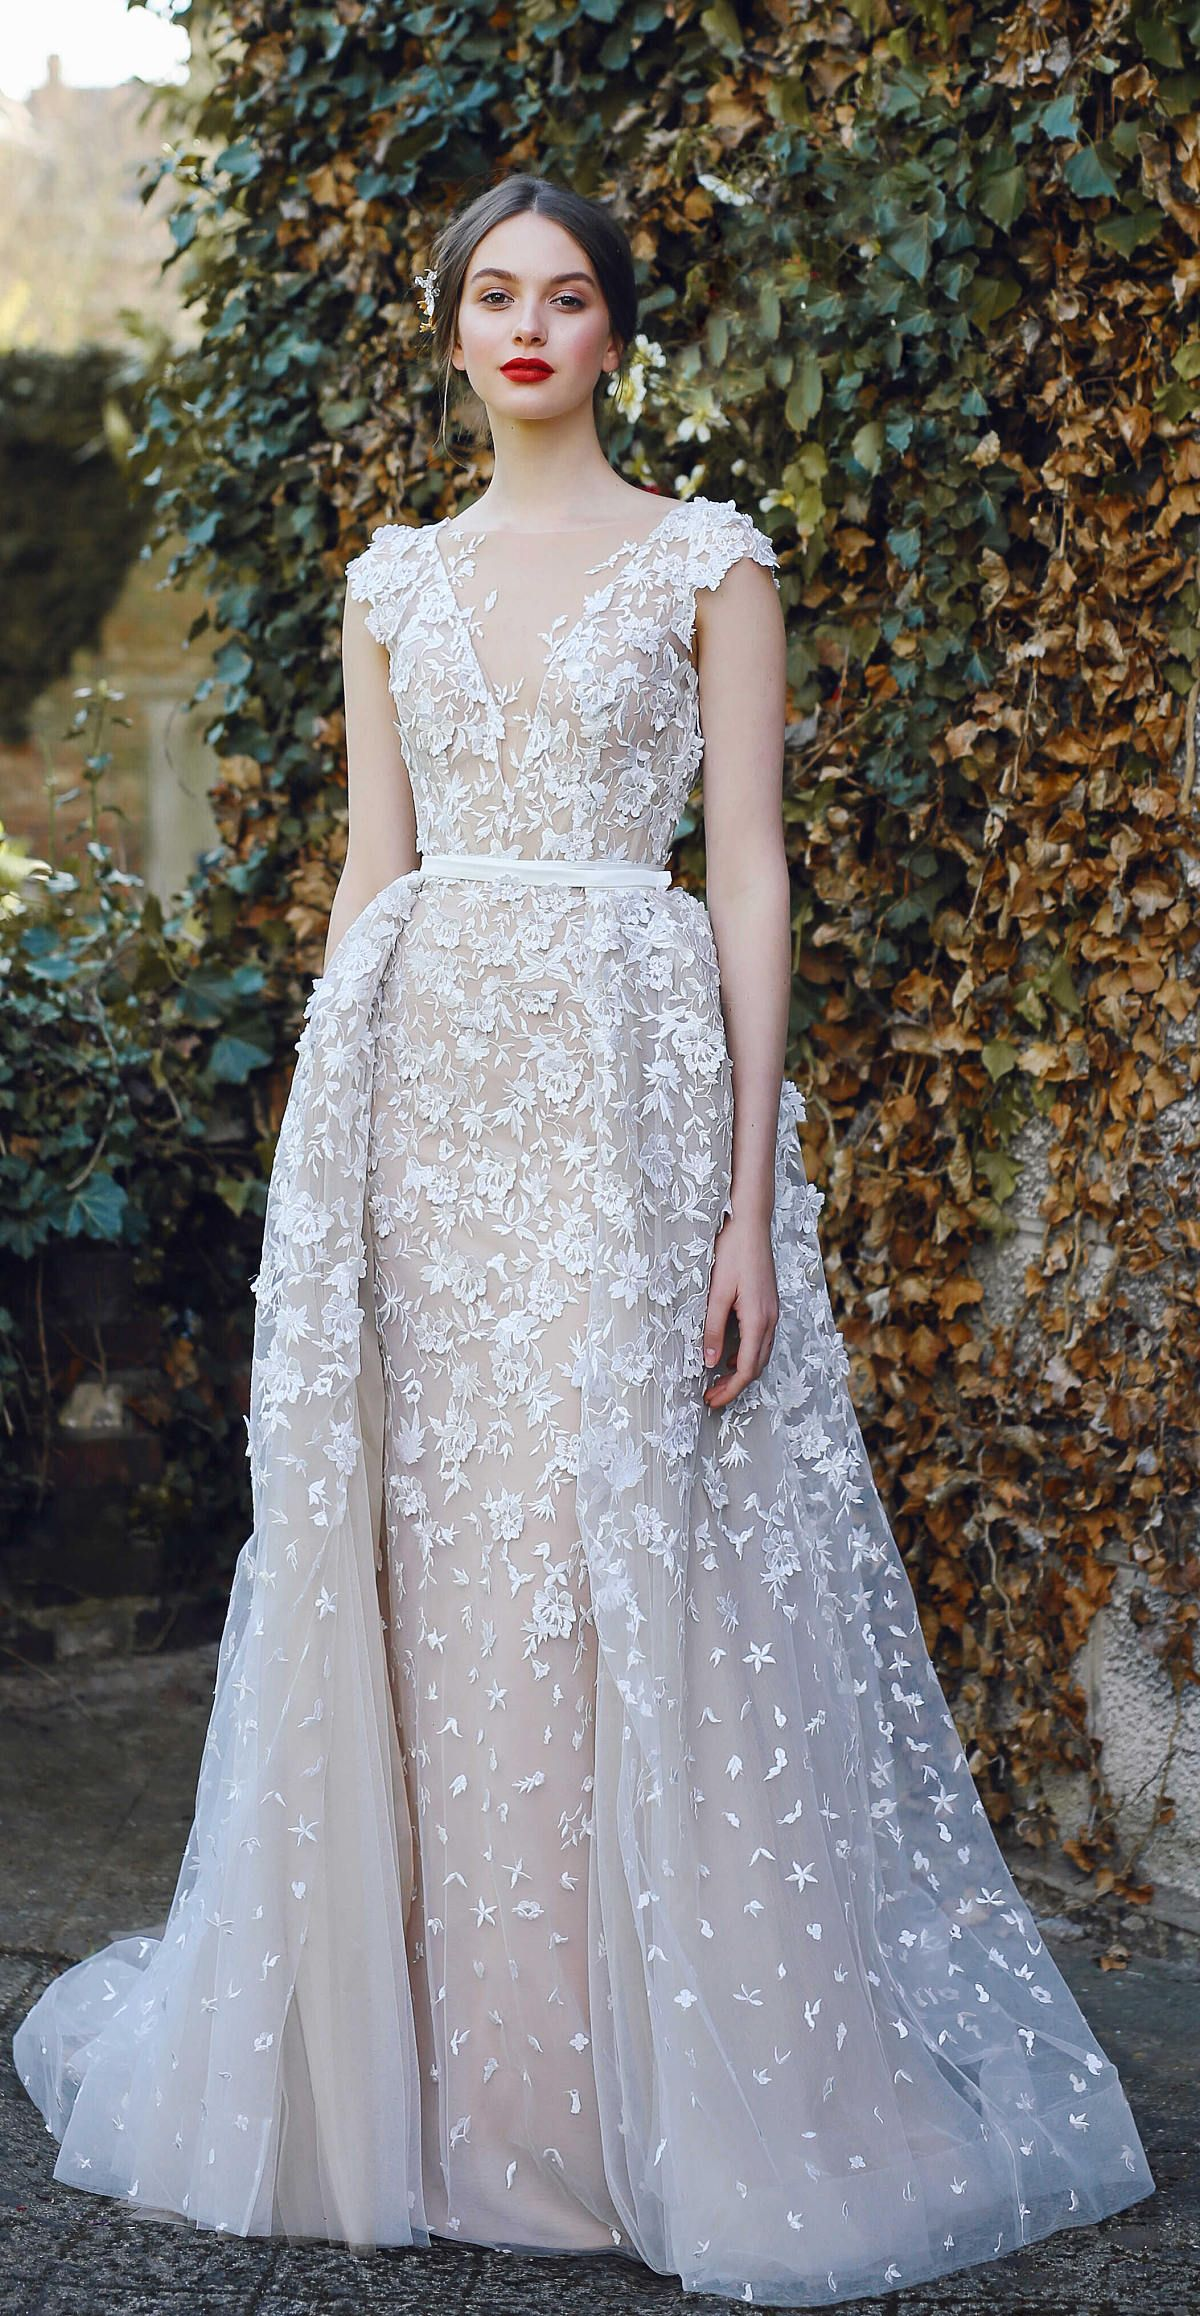 Simple lace dress styles  Bridal gown VELARI wedding dress unique wedding gown lace wedding